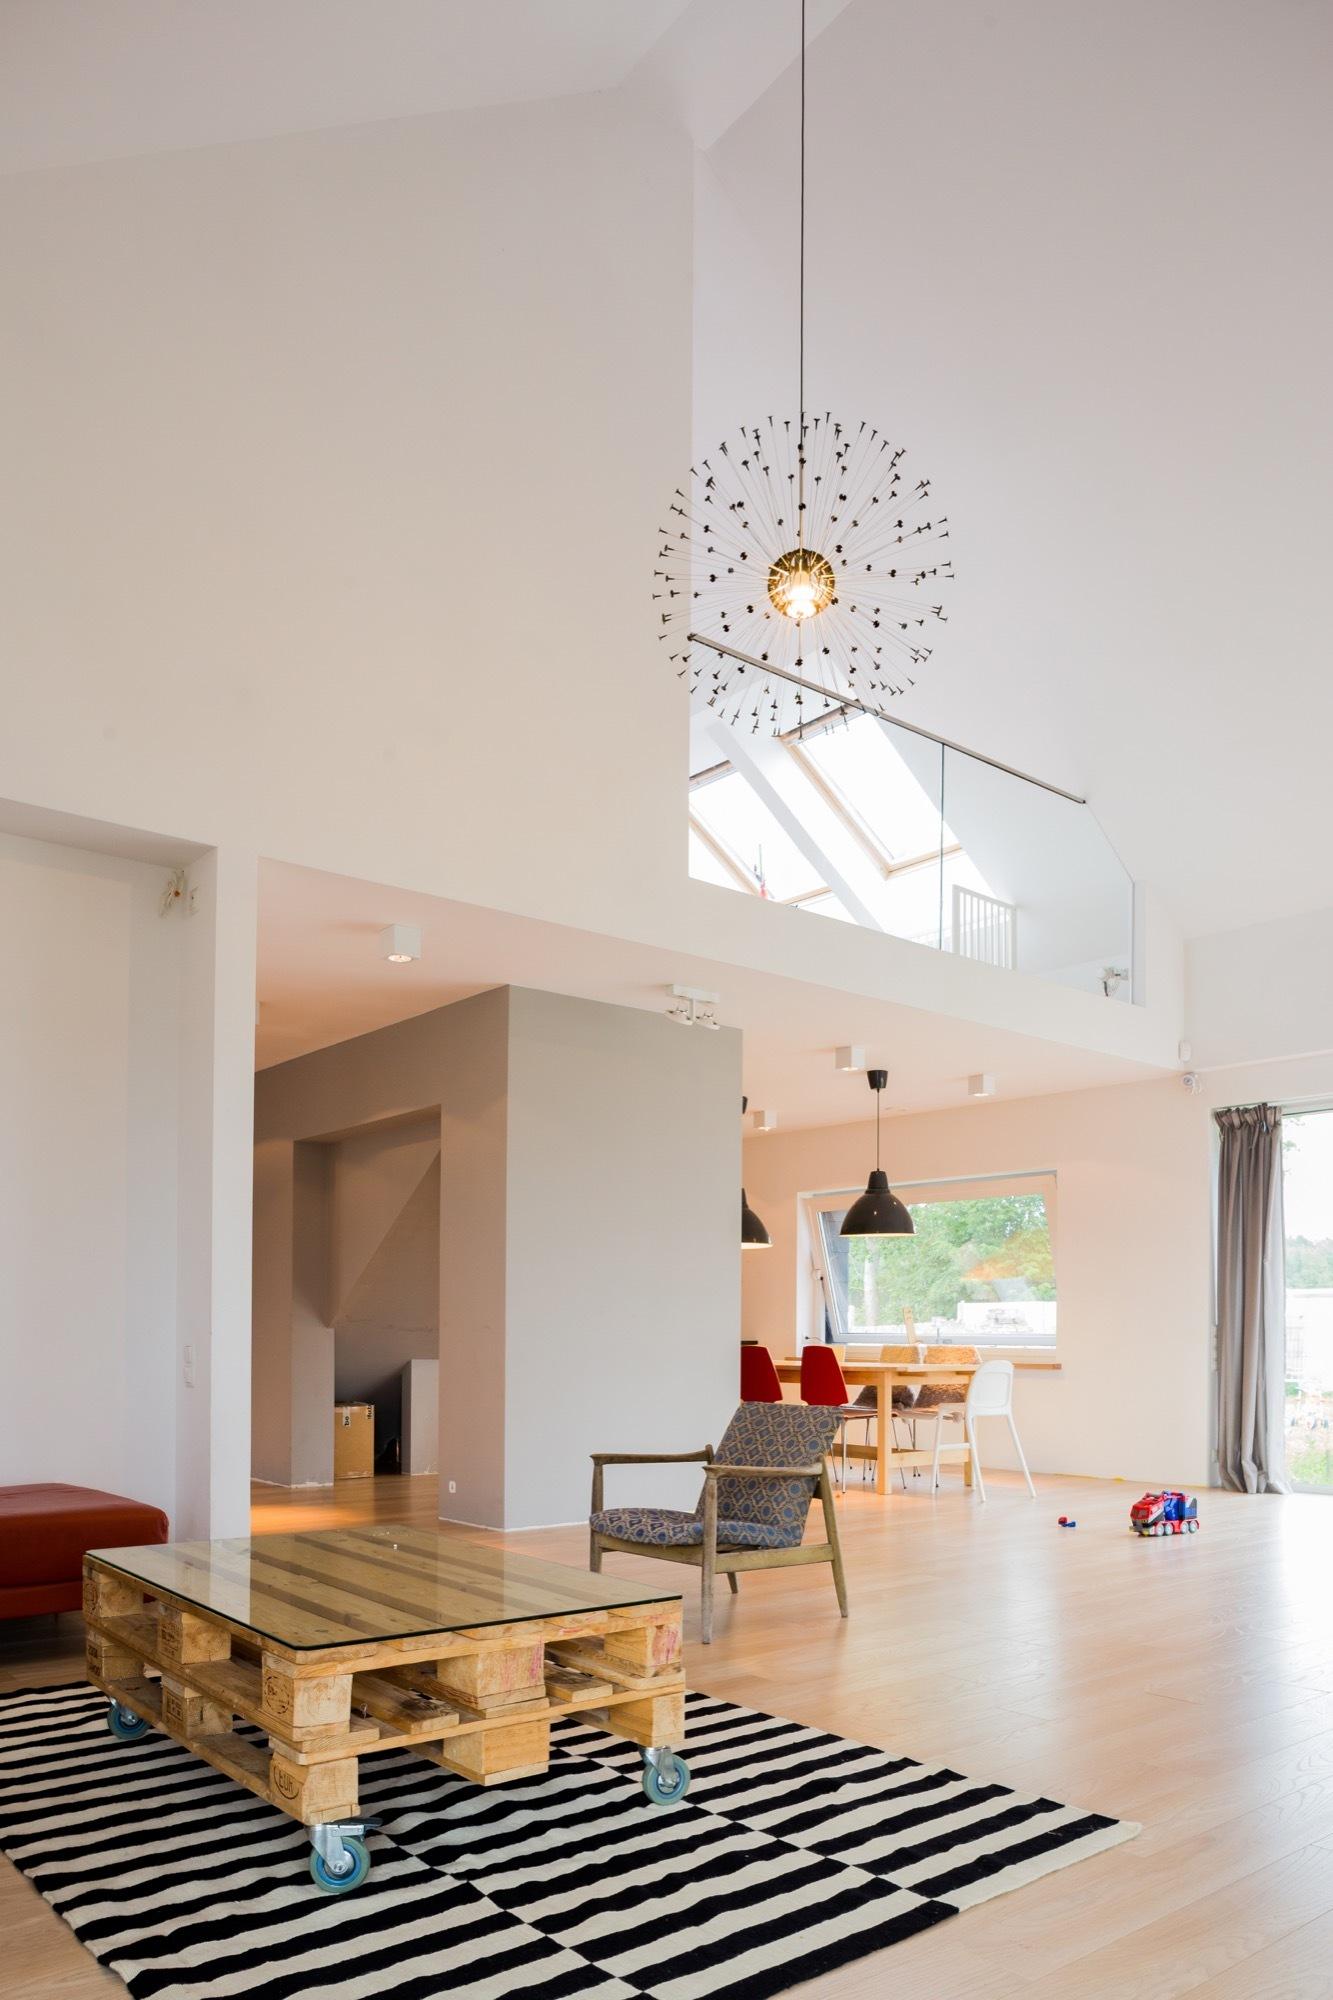 House in Kobylanka / Anna Thurow | ArchDaily